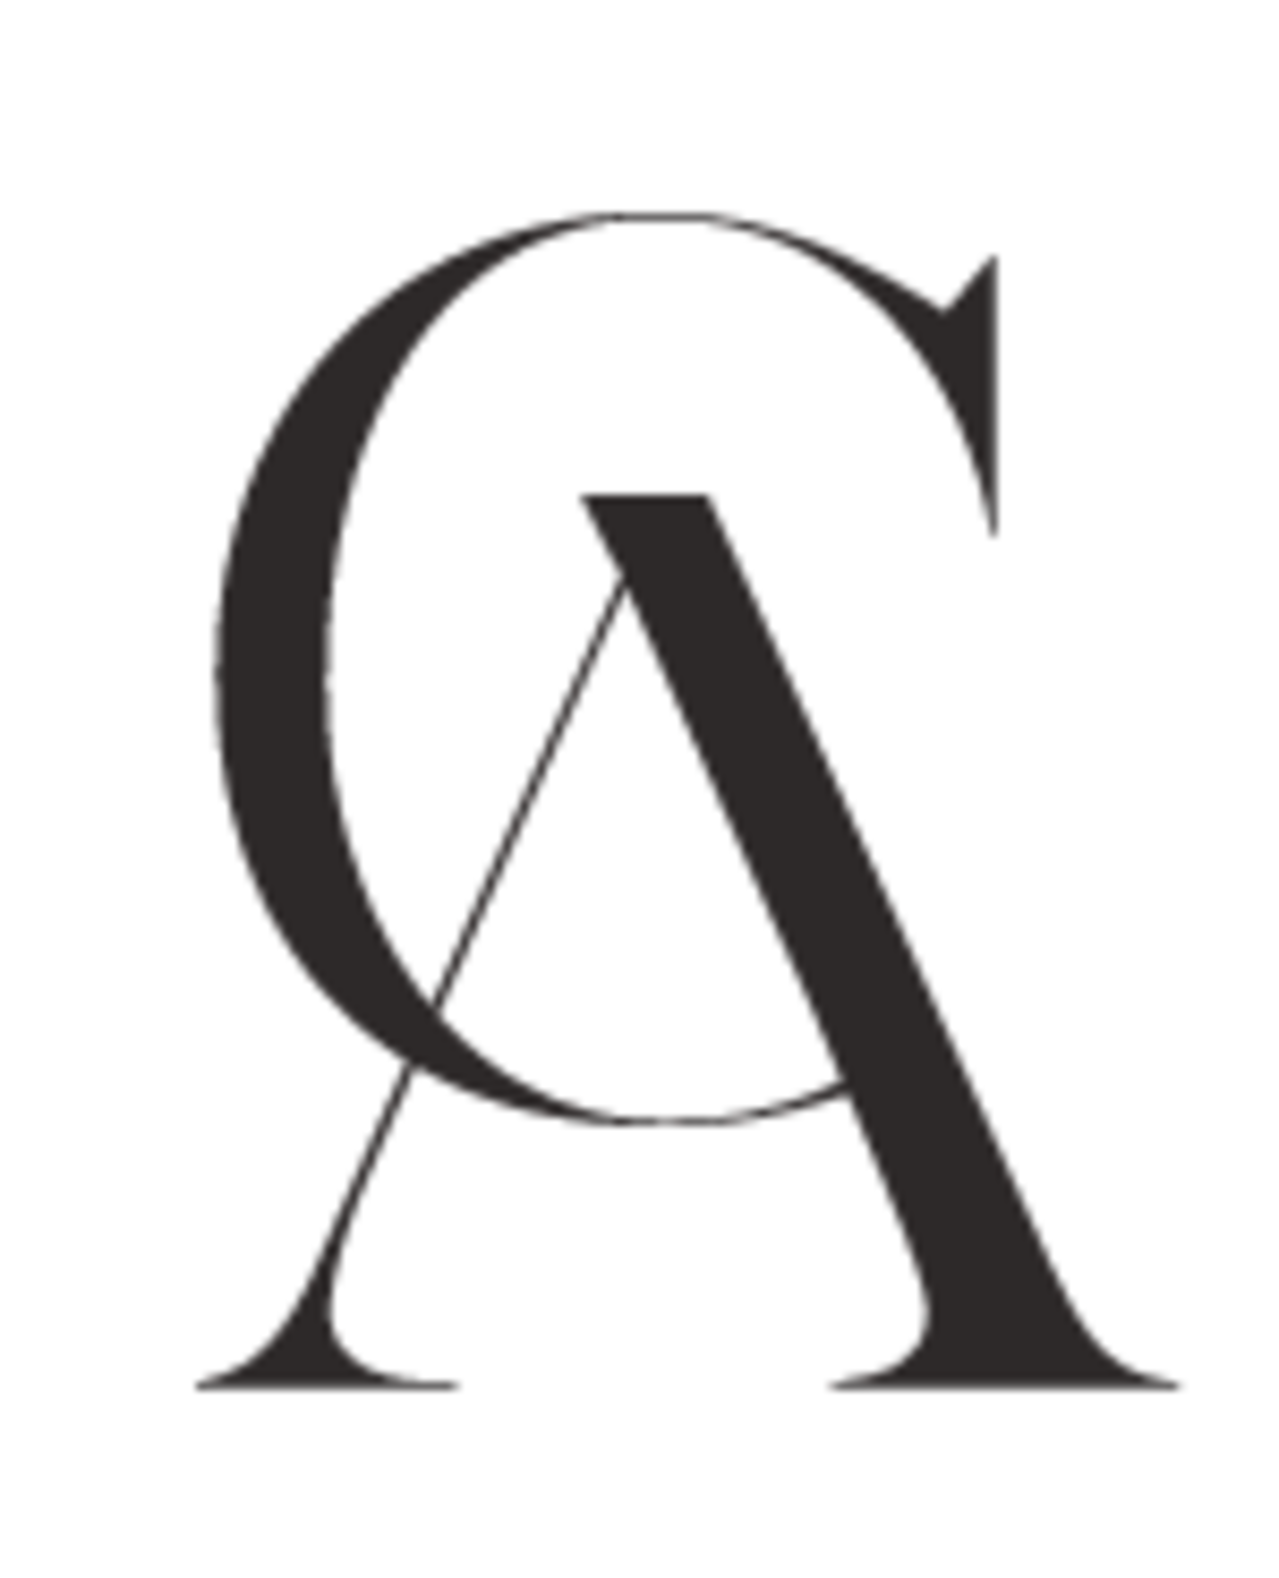 ca-creative-logopng.png